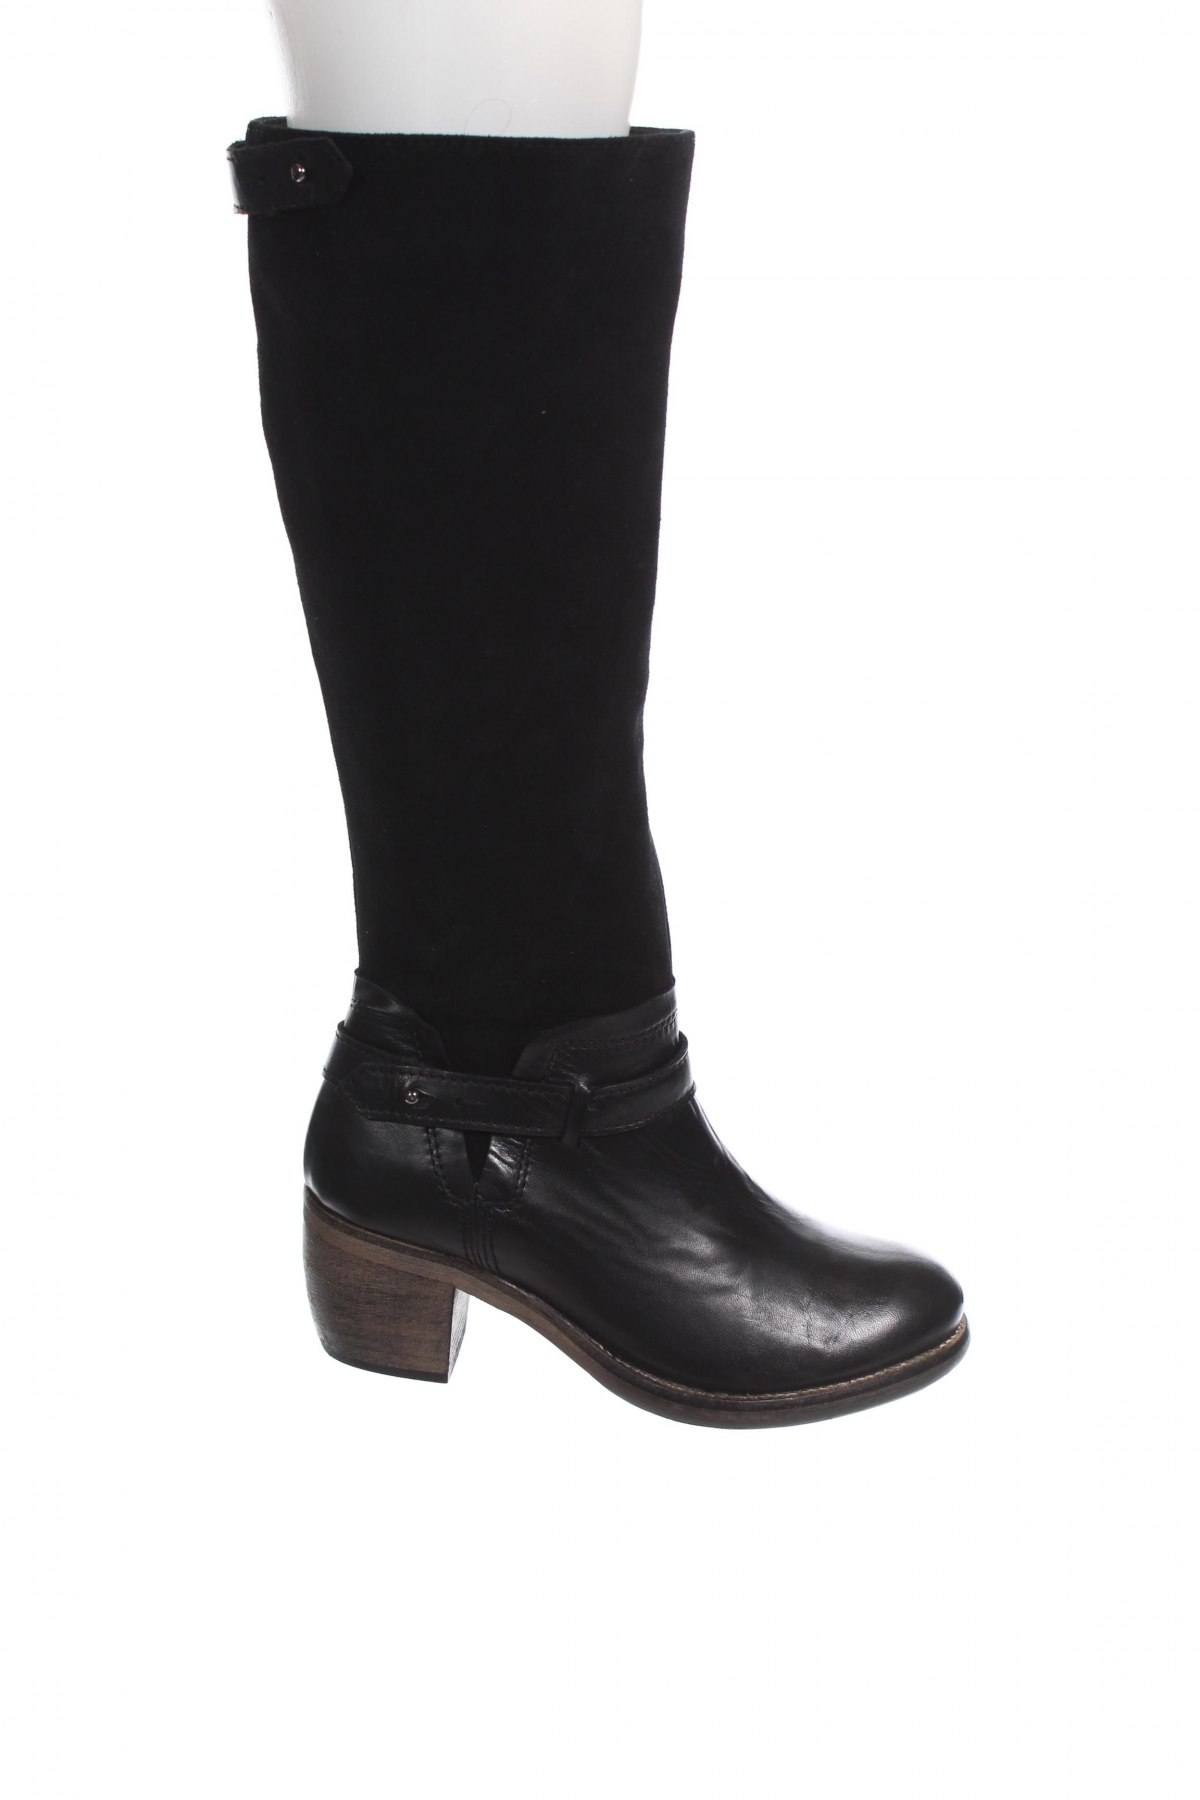 Dámske topánky  Petra Dieler